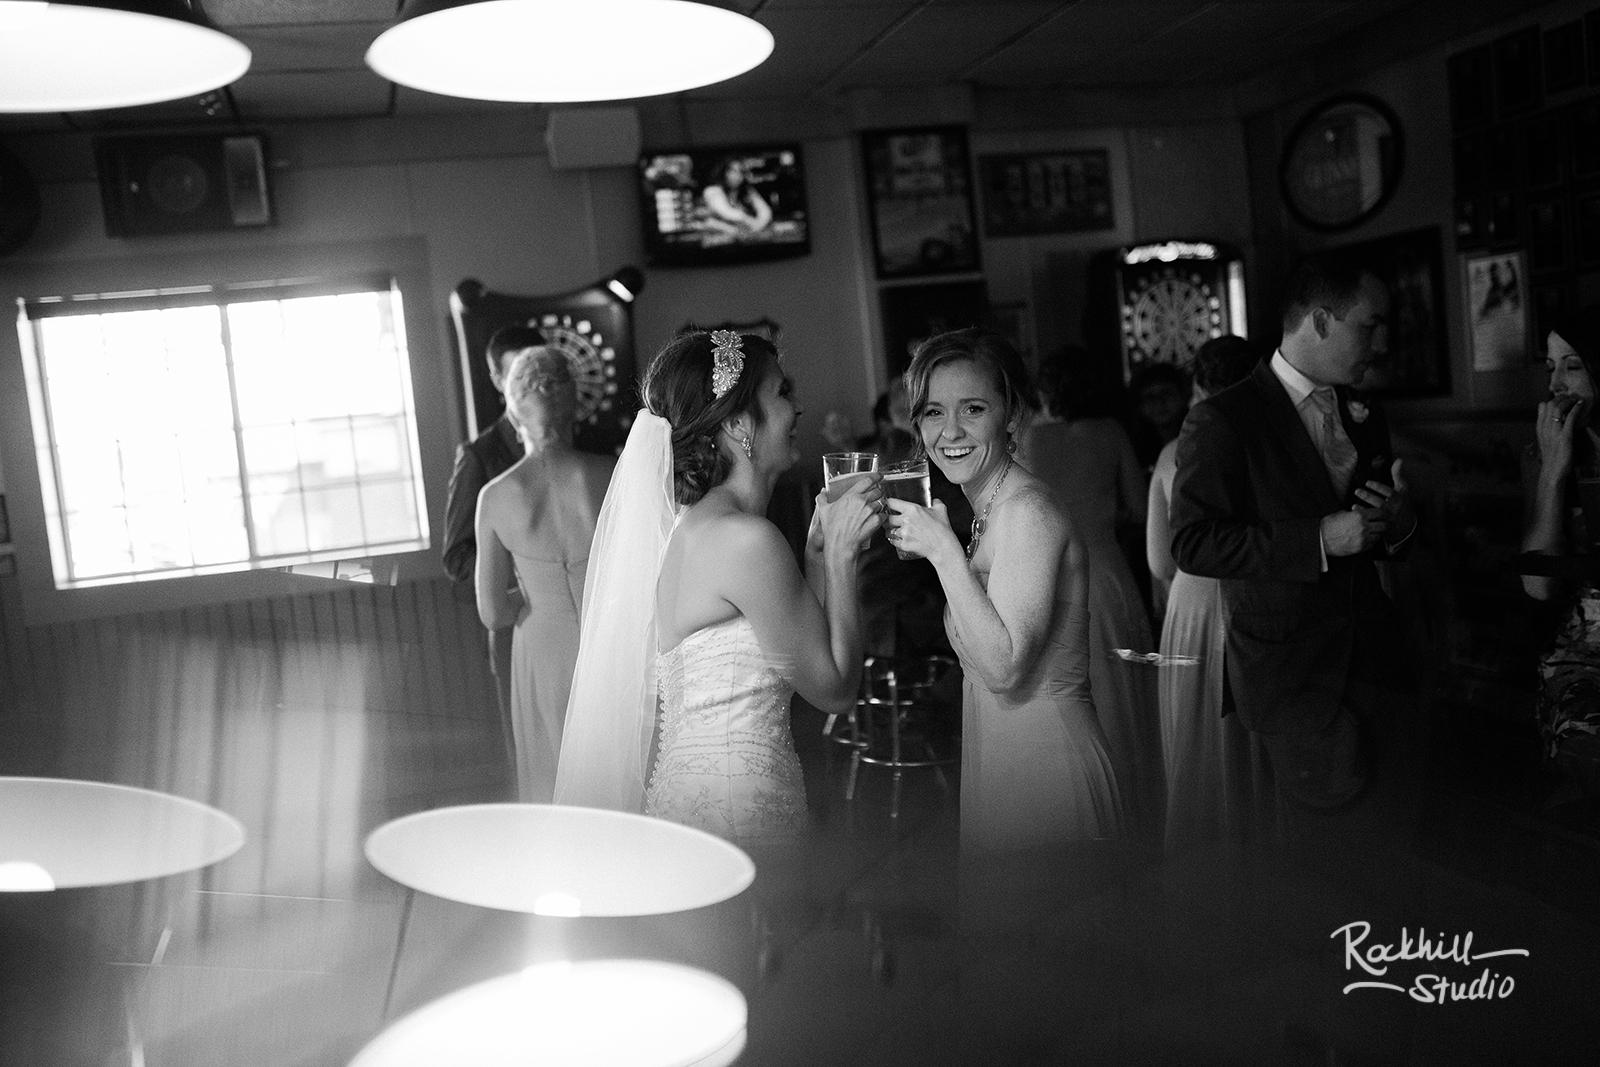 marquette-wedding-upper-peninsula-northern-michigan-wedding-ck-photography-bridegroom-3.jpg